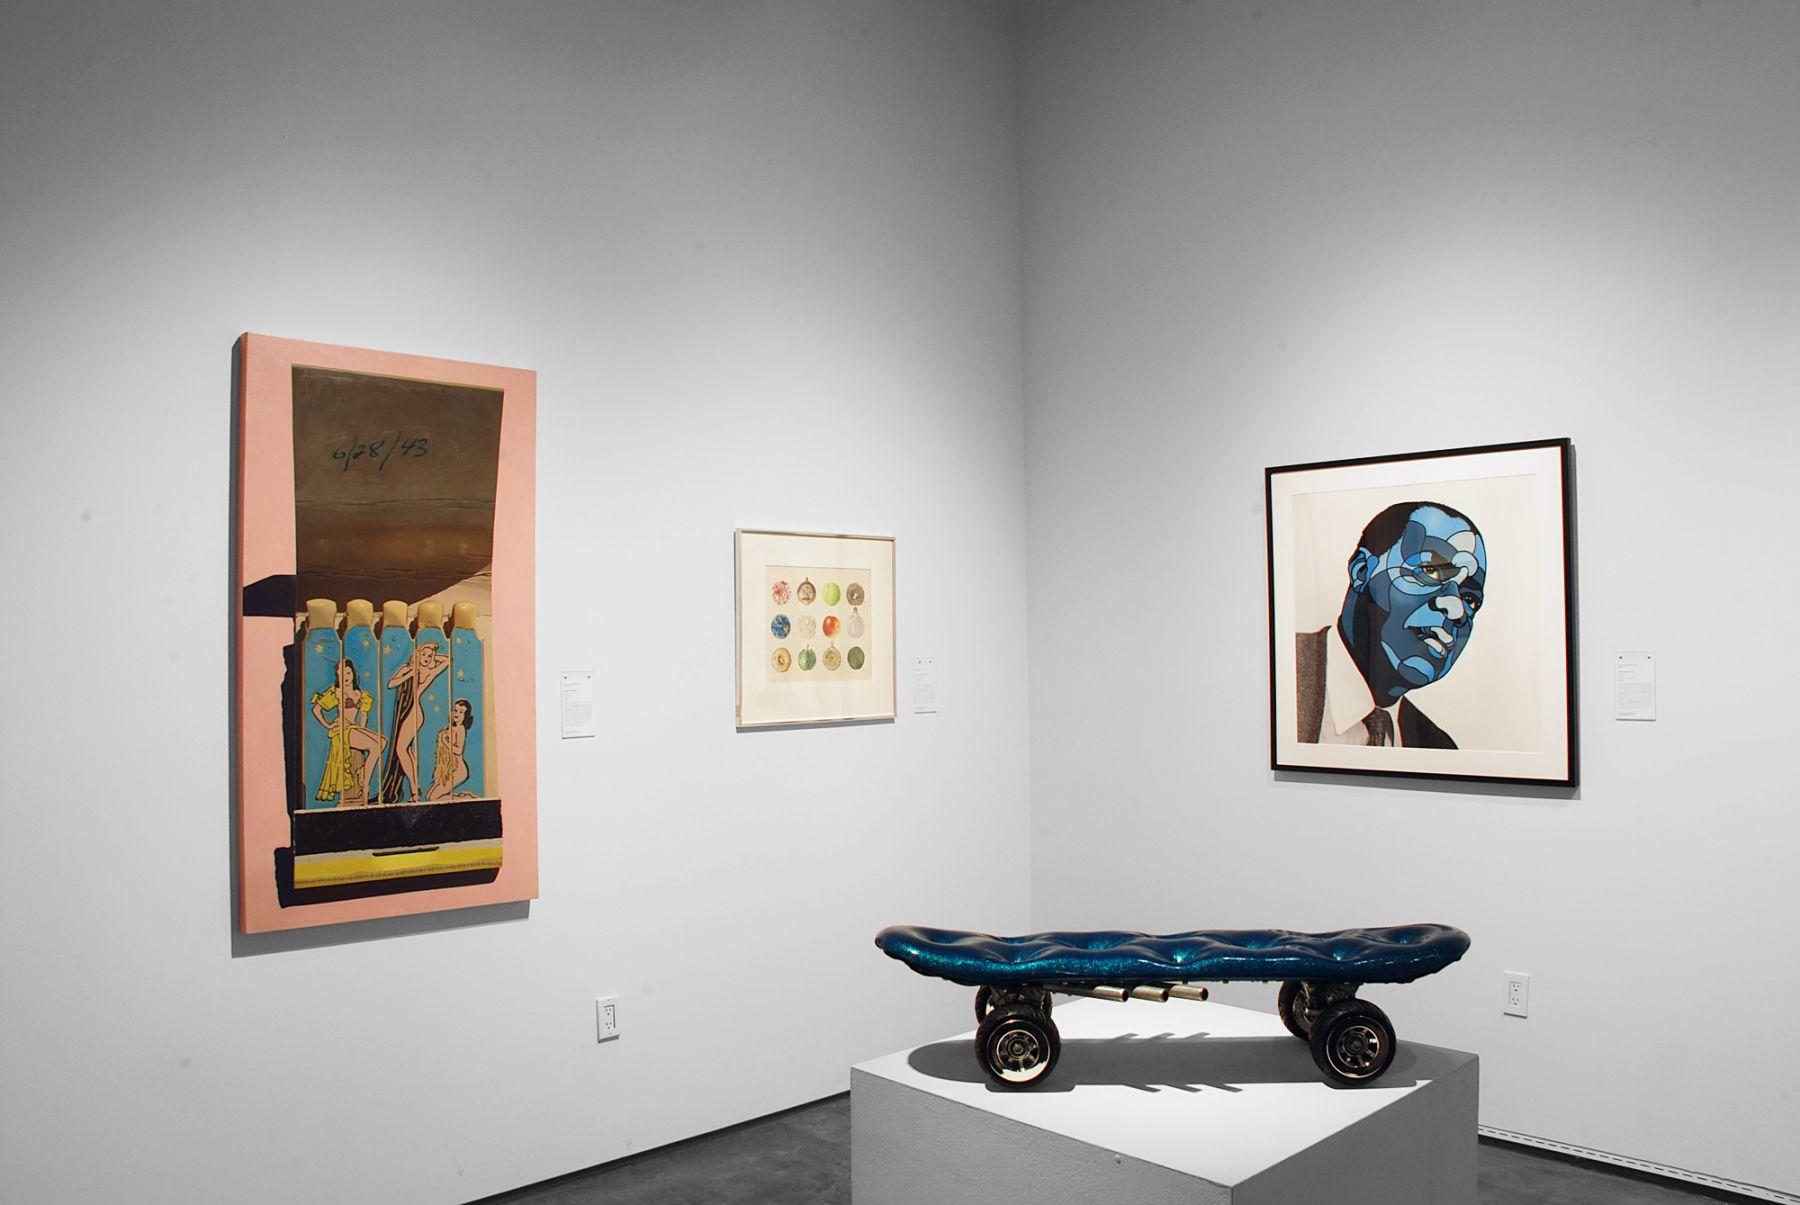 CA COOL installation photograph, Robert Townsend, Jean Swiggett, David Flores, Dan Levin